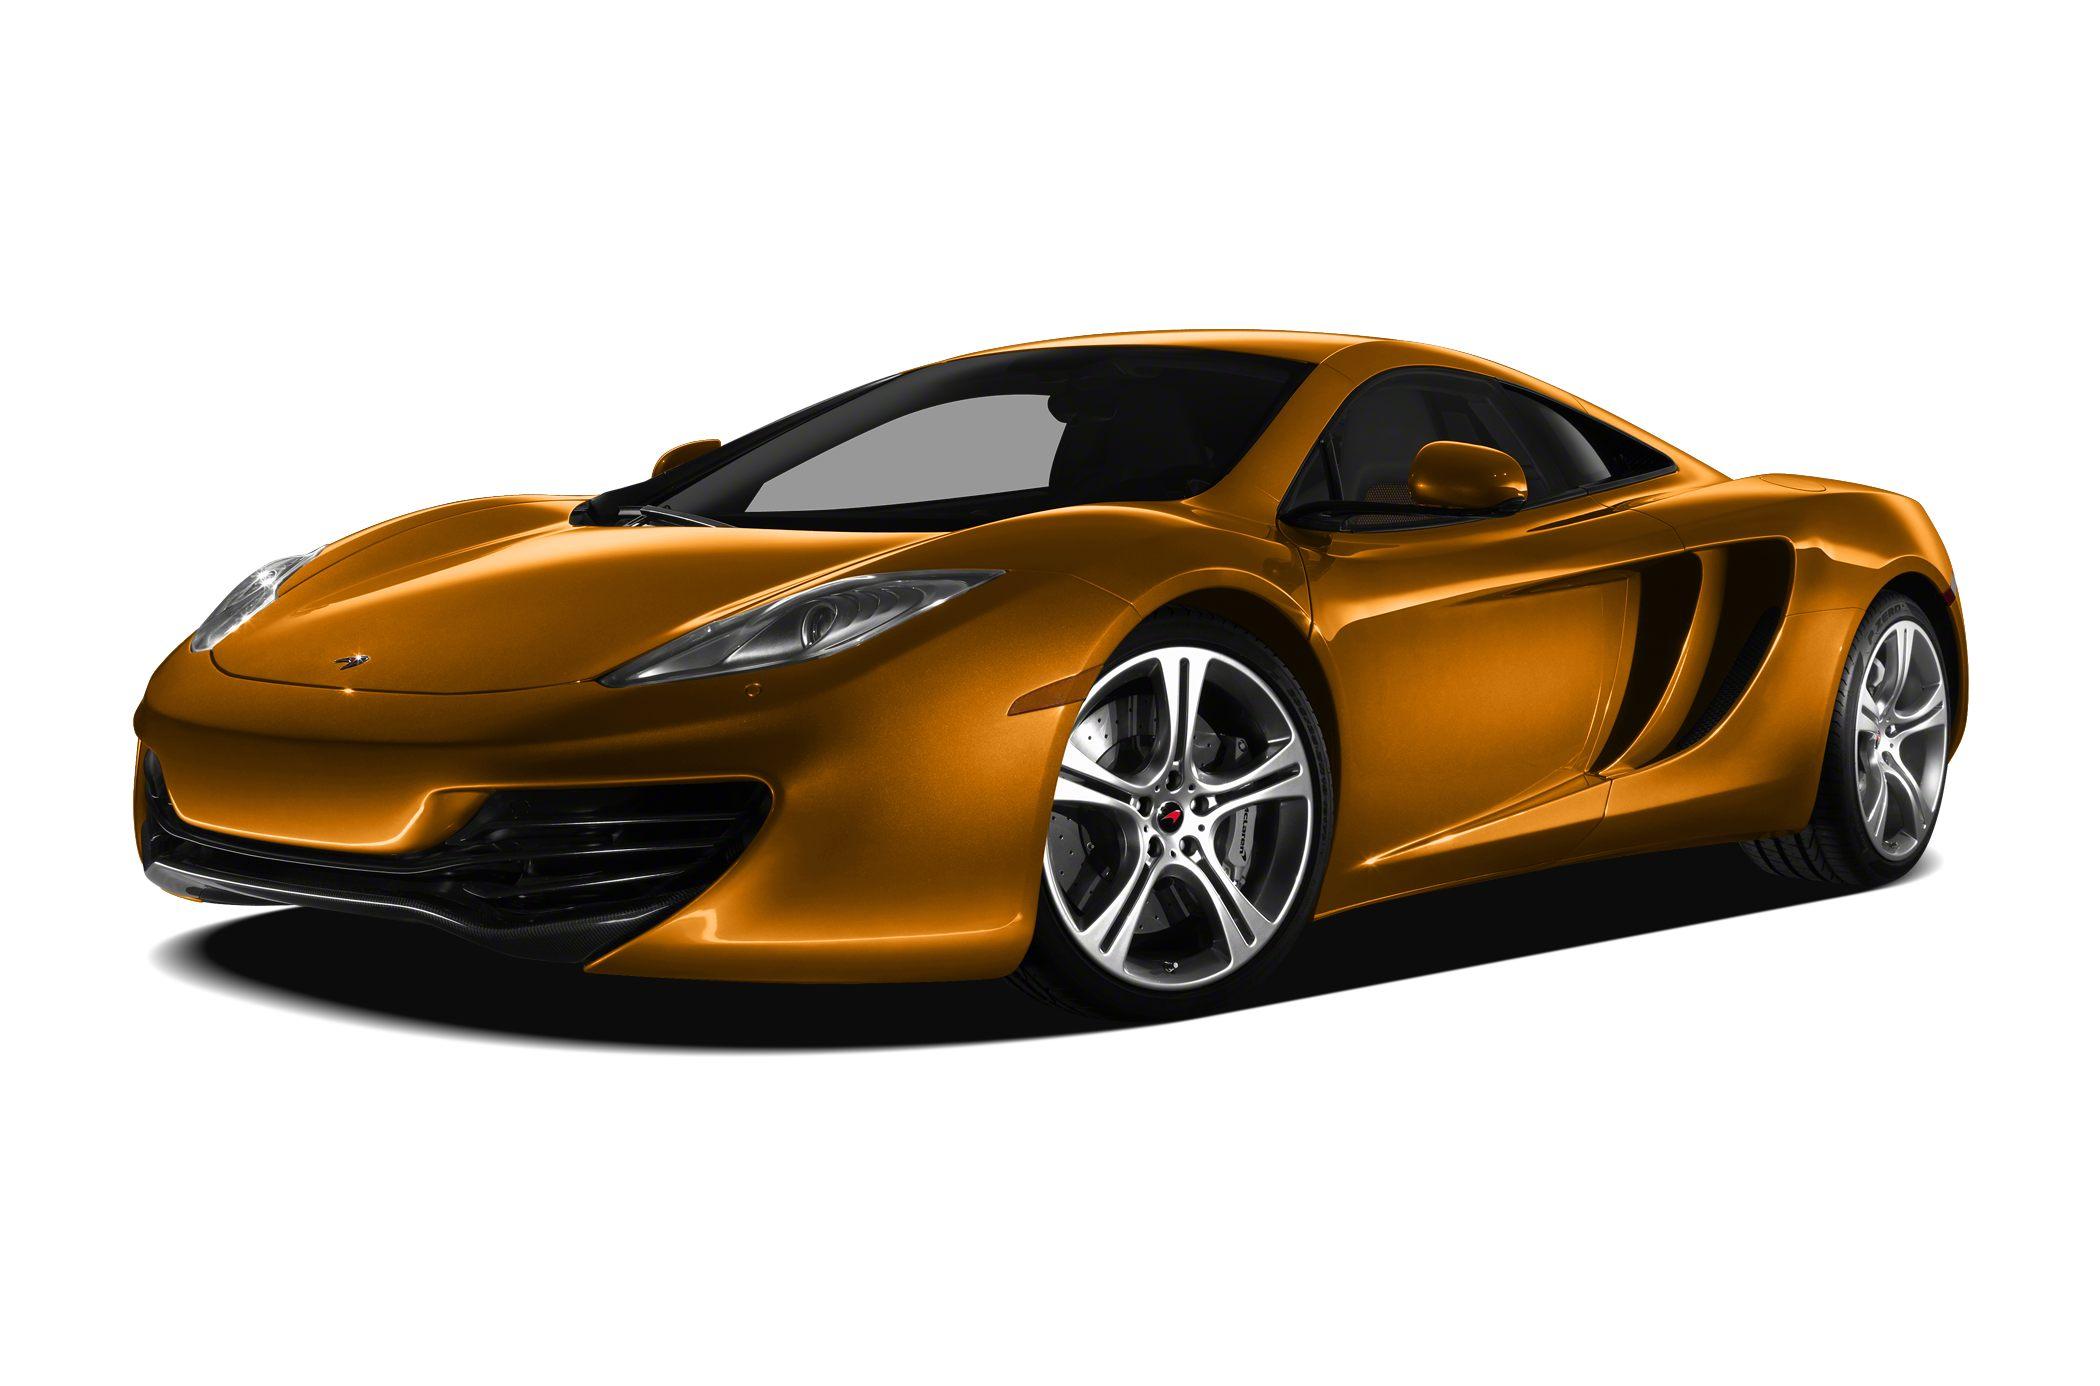 2014 honda element release date autos post